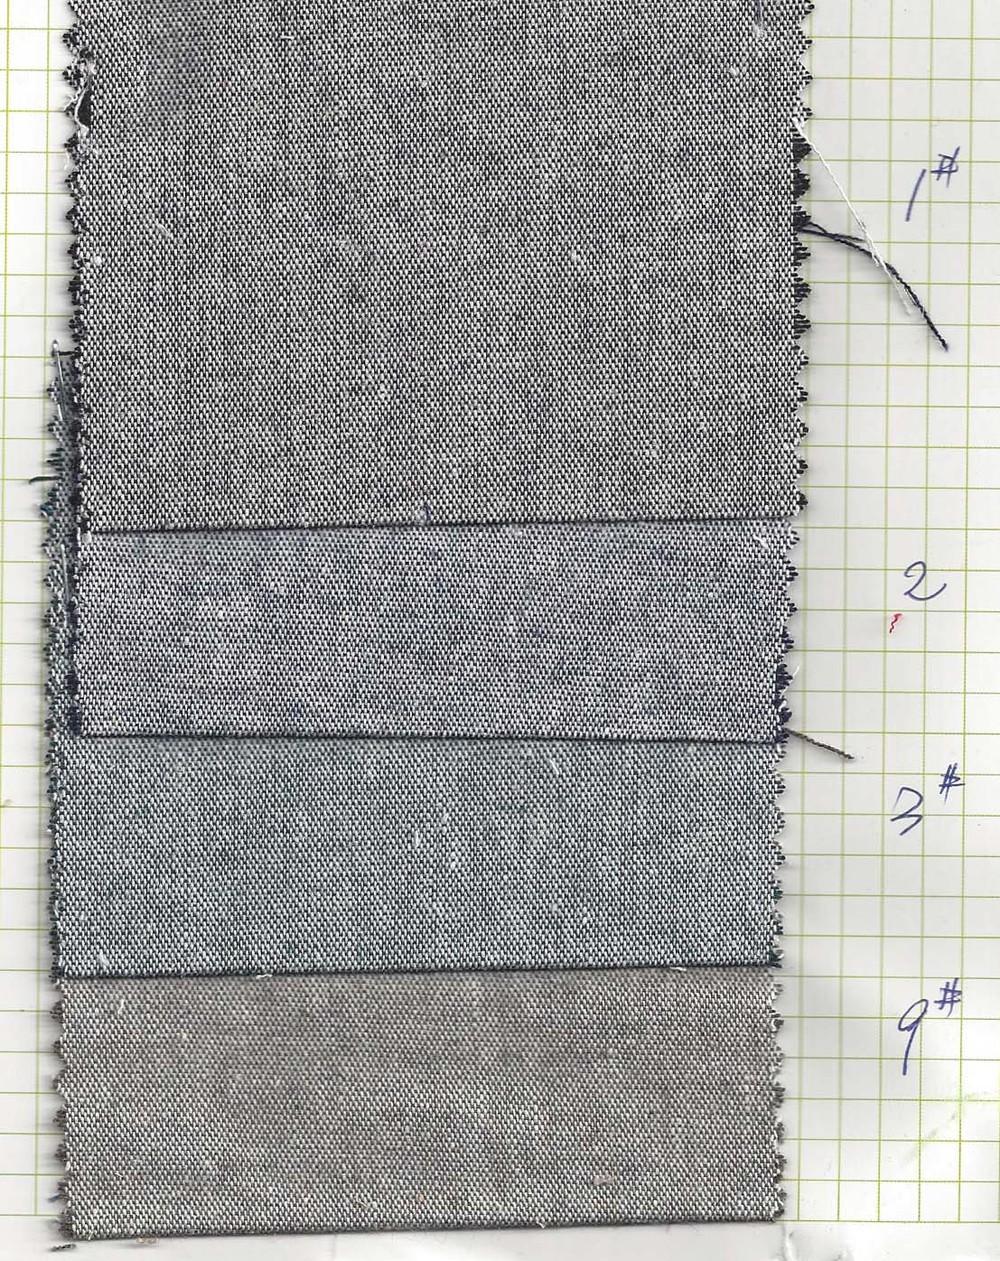 Yuan Xin Textile 7012.jpg